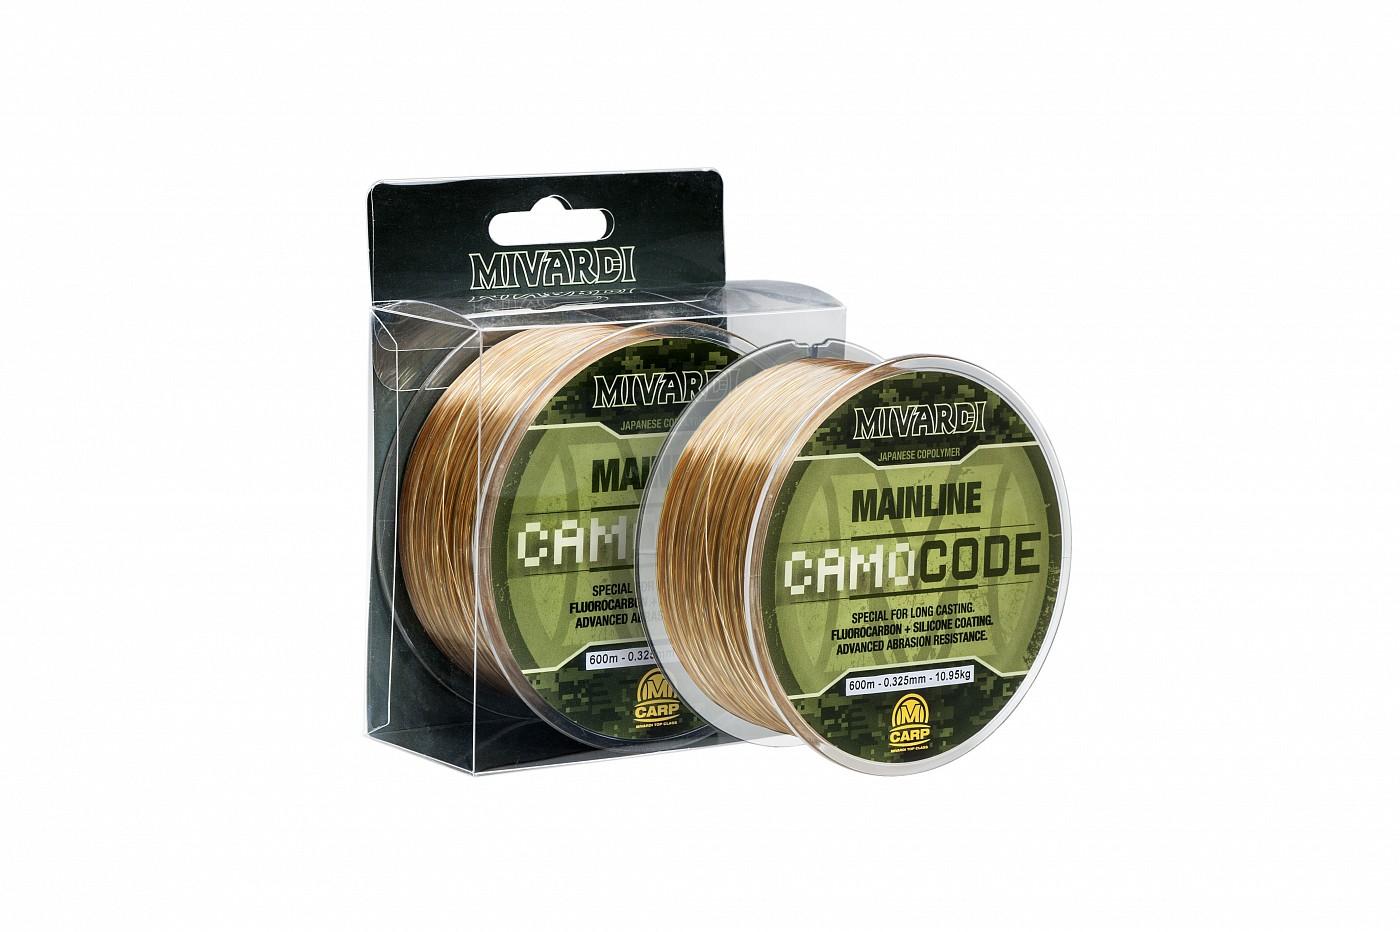 MIV-LCM12025 CamoCODE Mainline 0.255mm 1200m 1200m 0.255mm